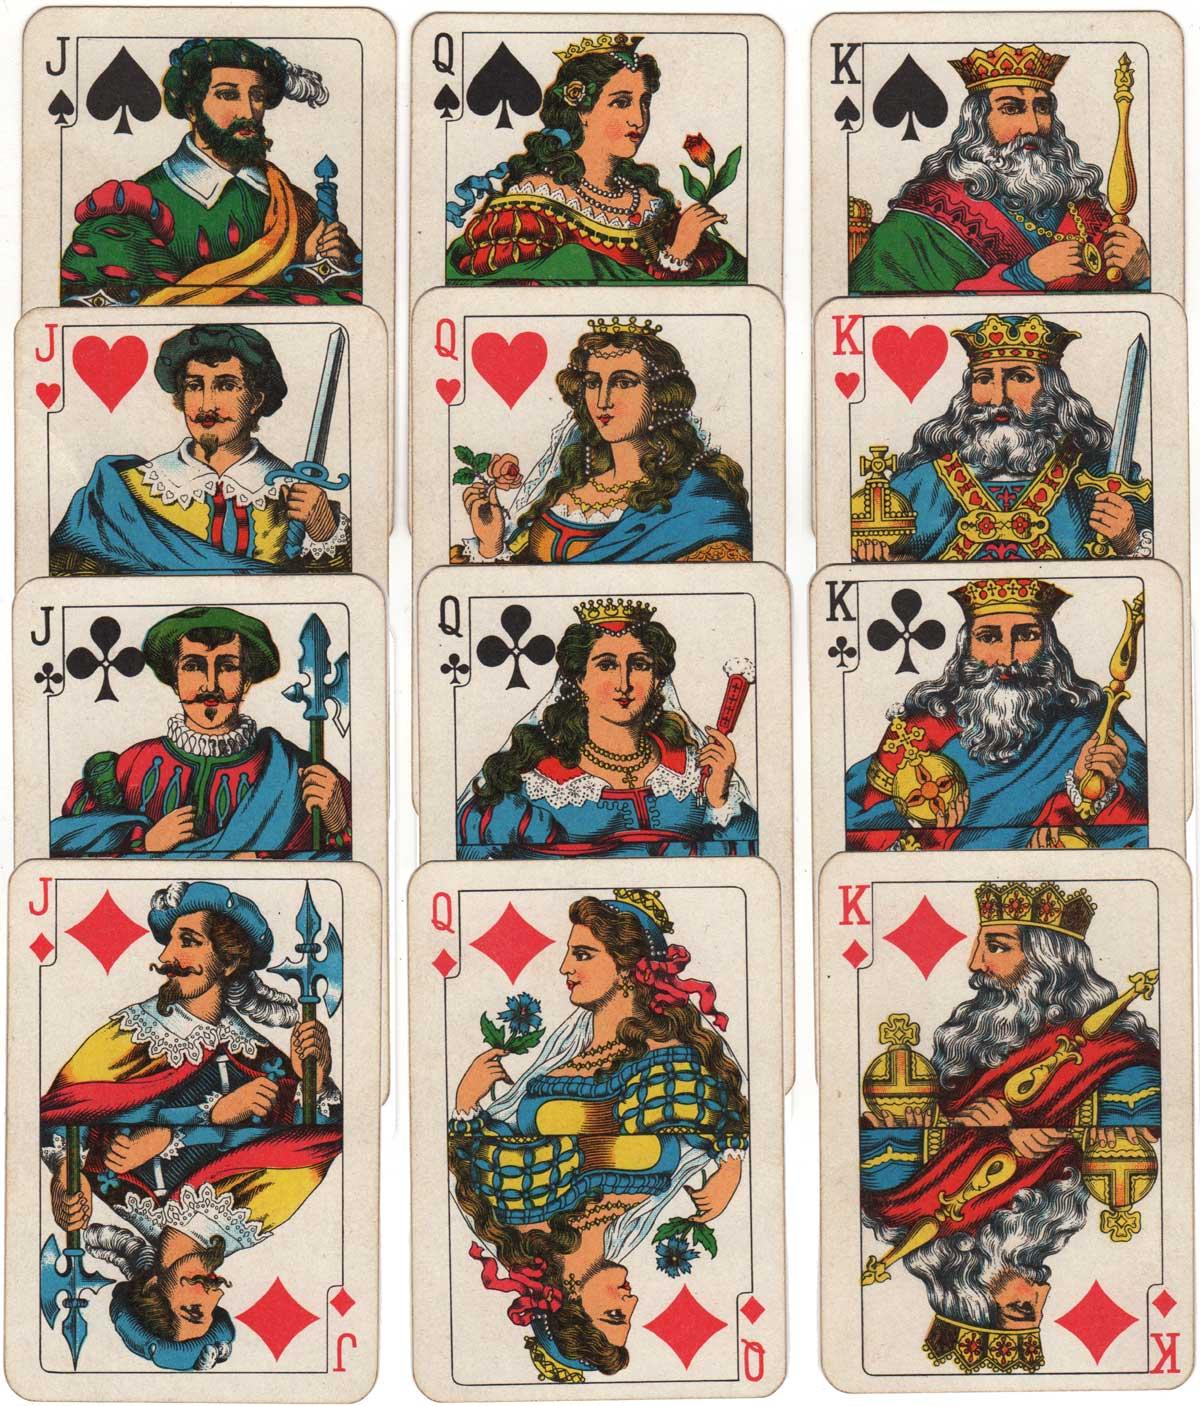 Rhineland pattern printed by KZWP, c.1986